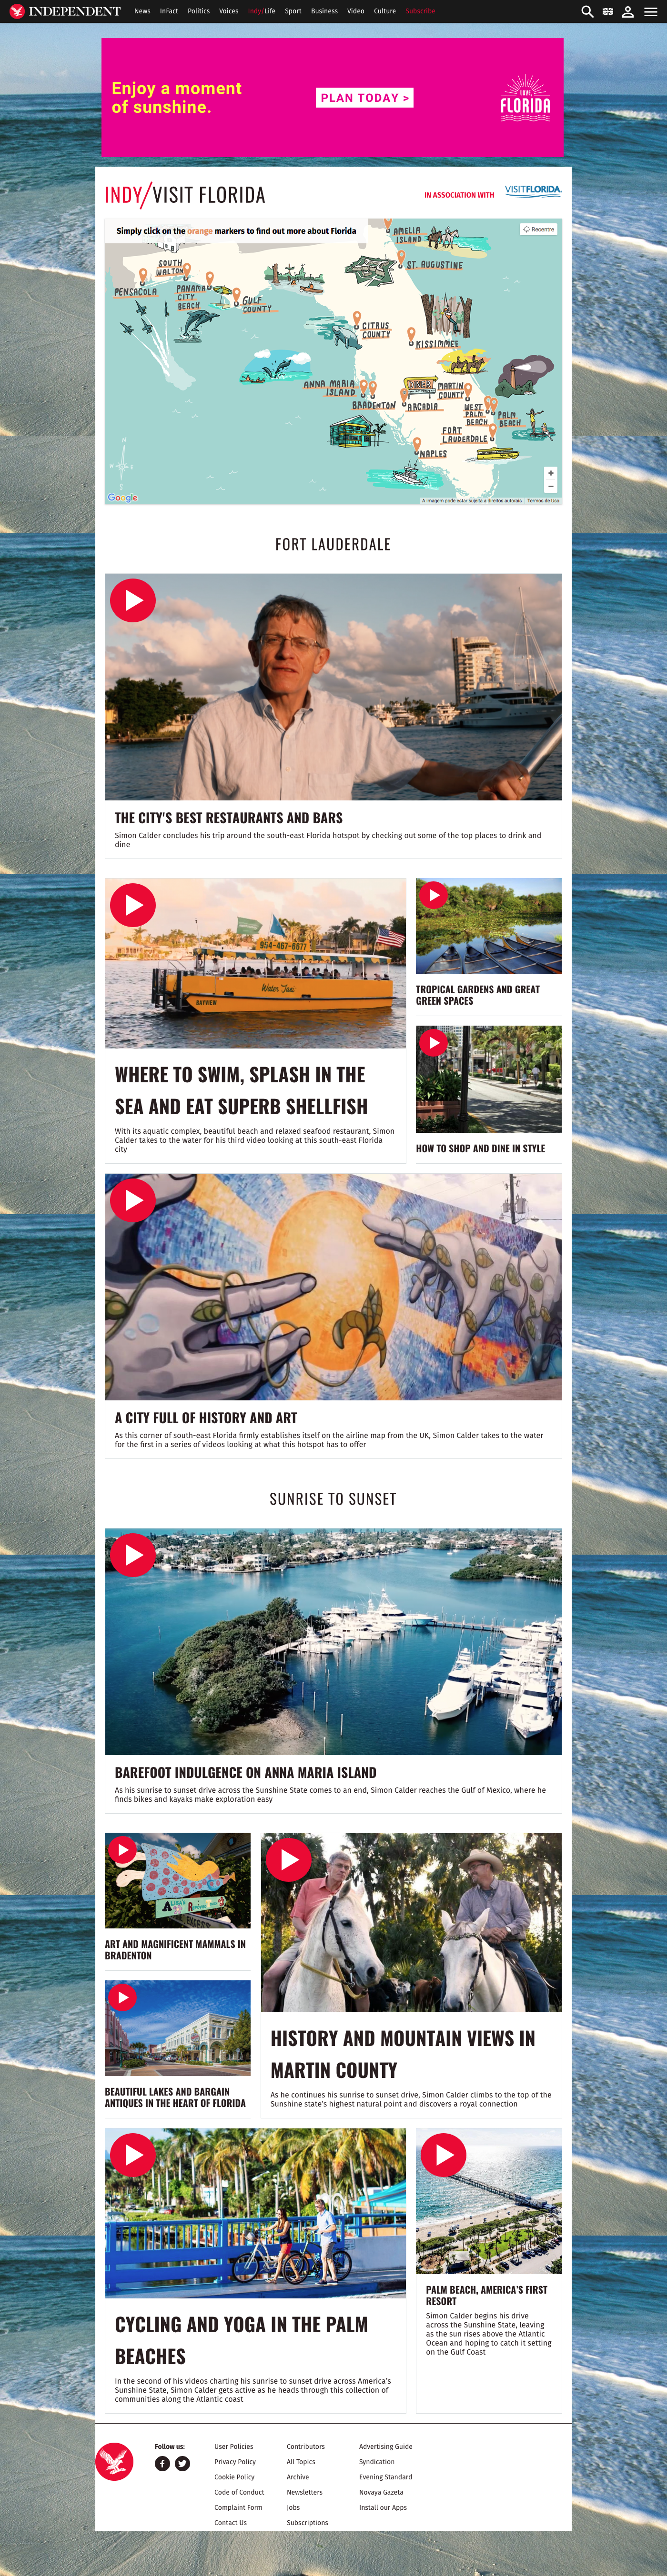 Independent brand partnership interactive map Travel